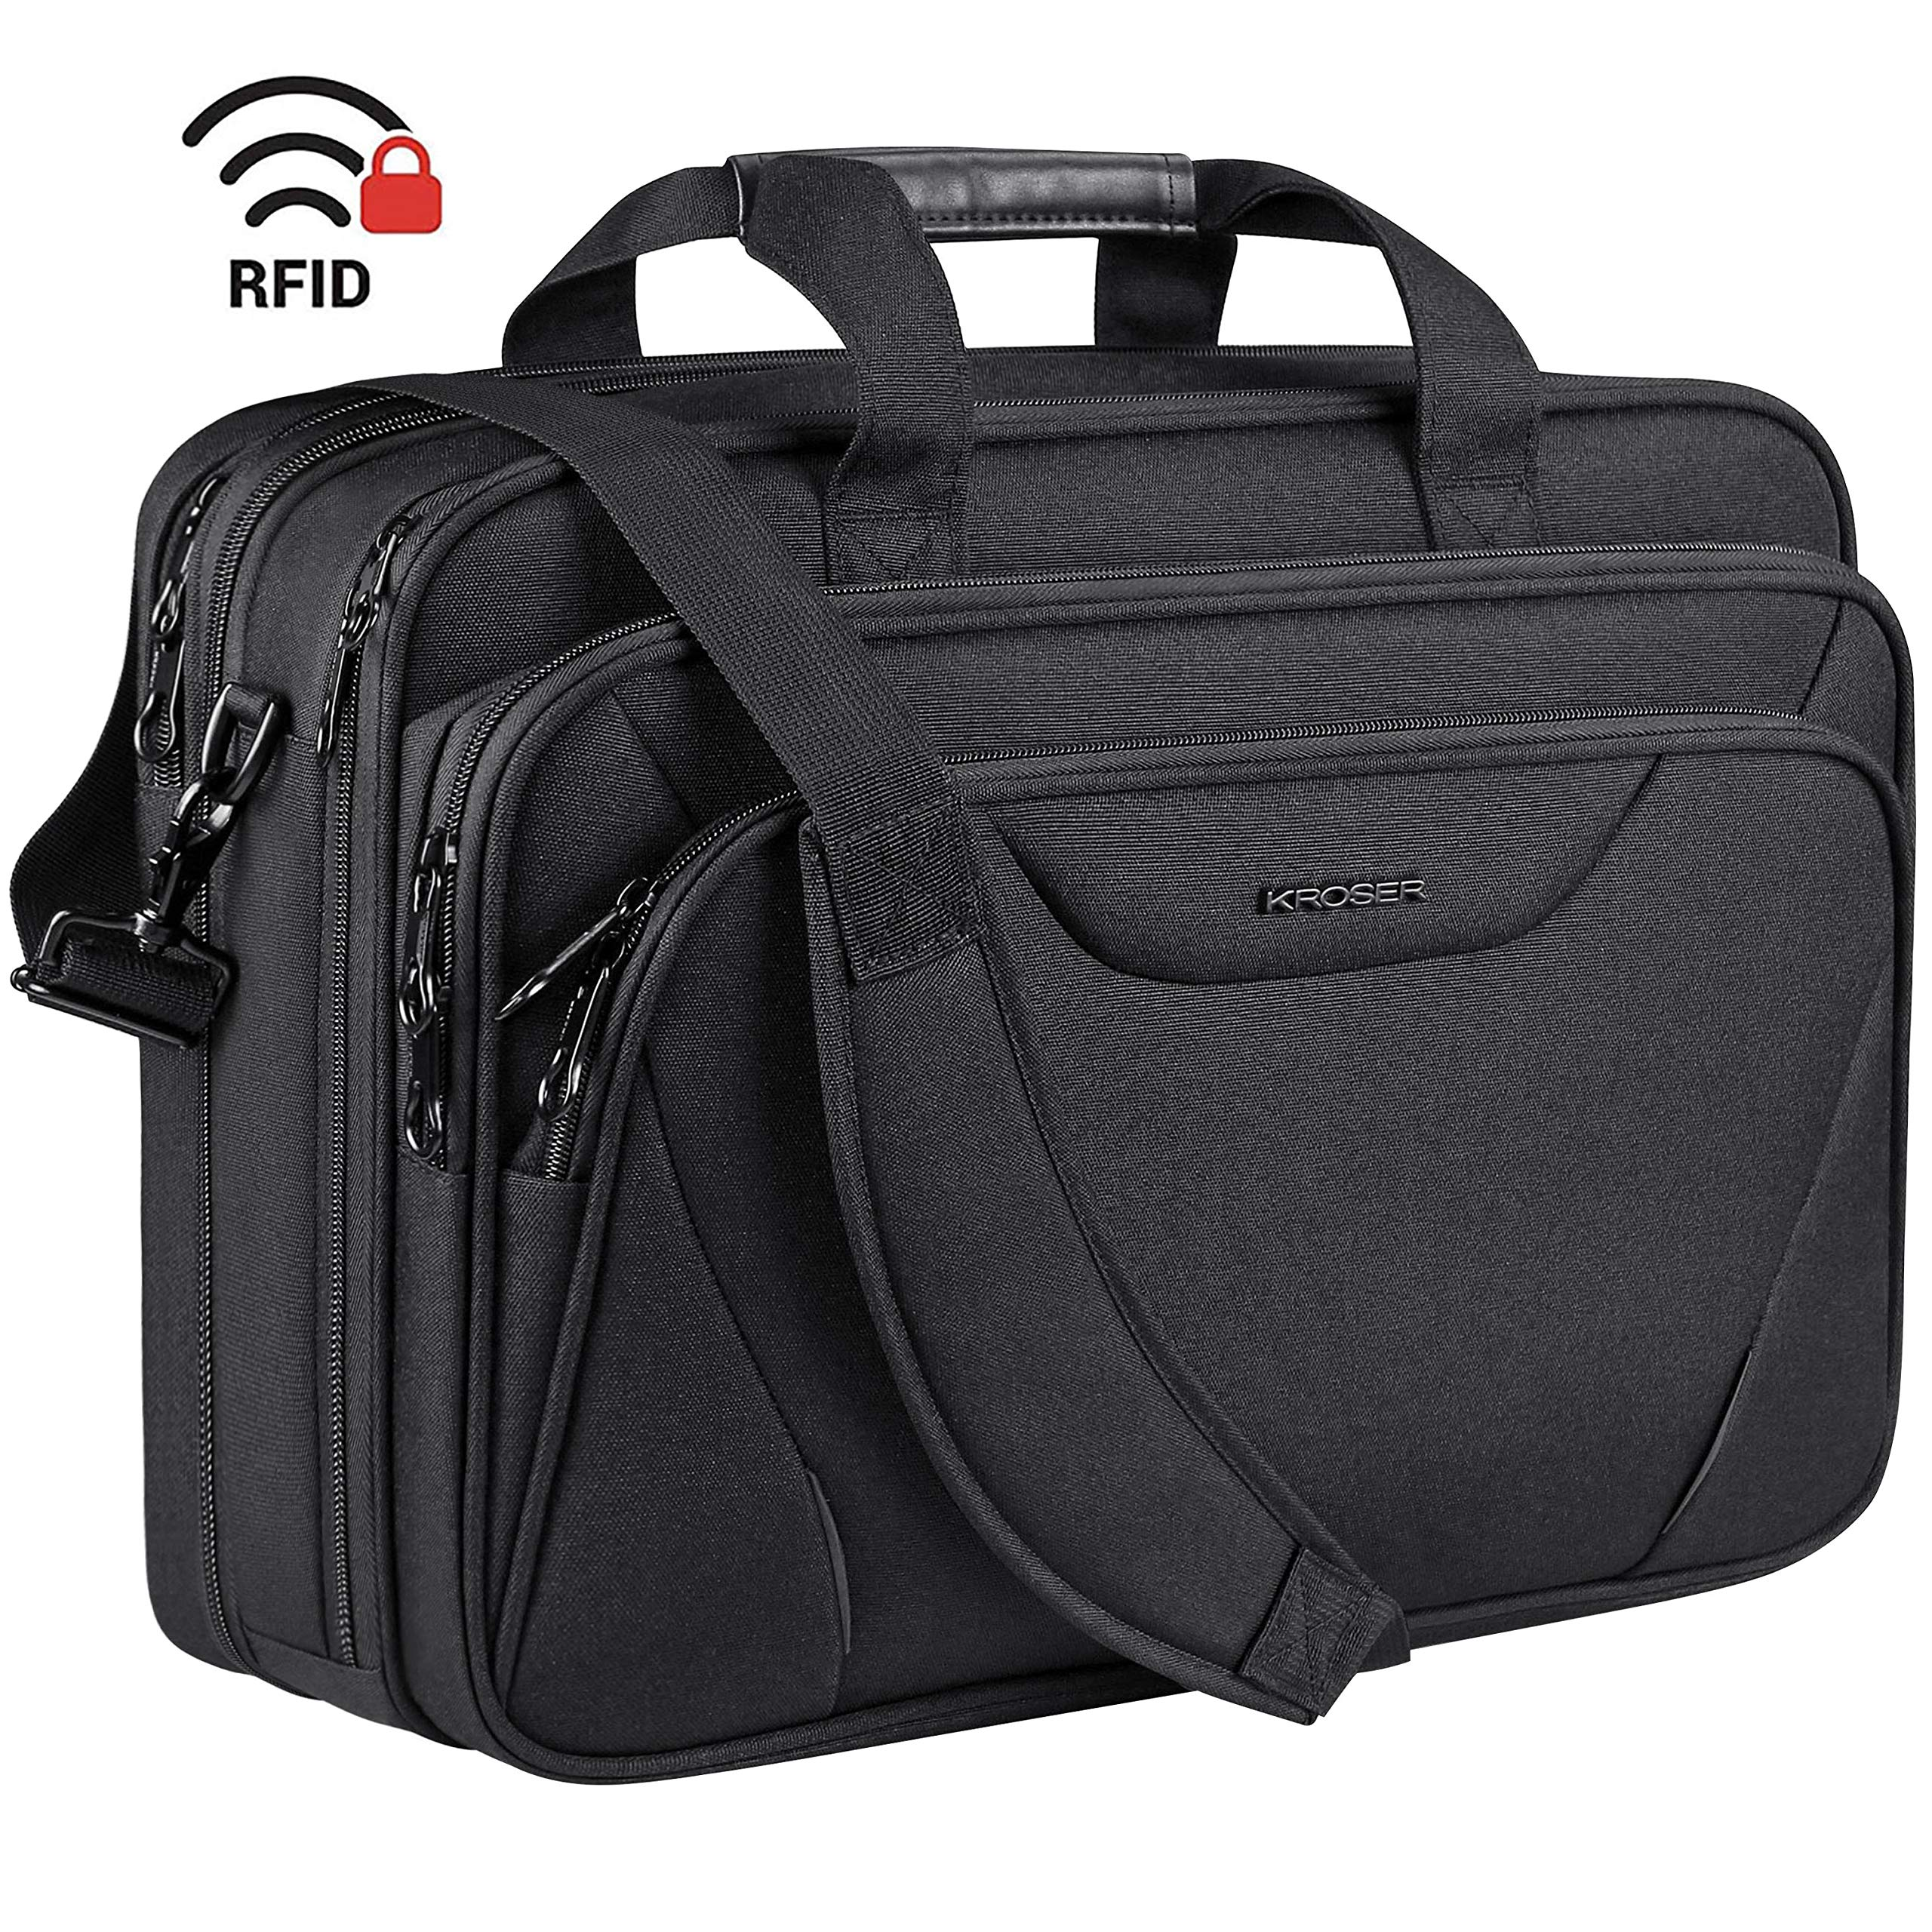 KROSER 18'' Laptop Bag Premium Laptop Briefcase Fits Up to 17.3 Inch Laptop Expandable Water-Repellent Shoulder Messenger Bag Computer Bag for Travel/Business/School/Men/Women-Black